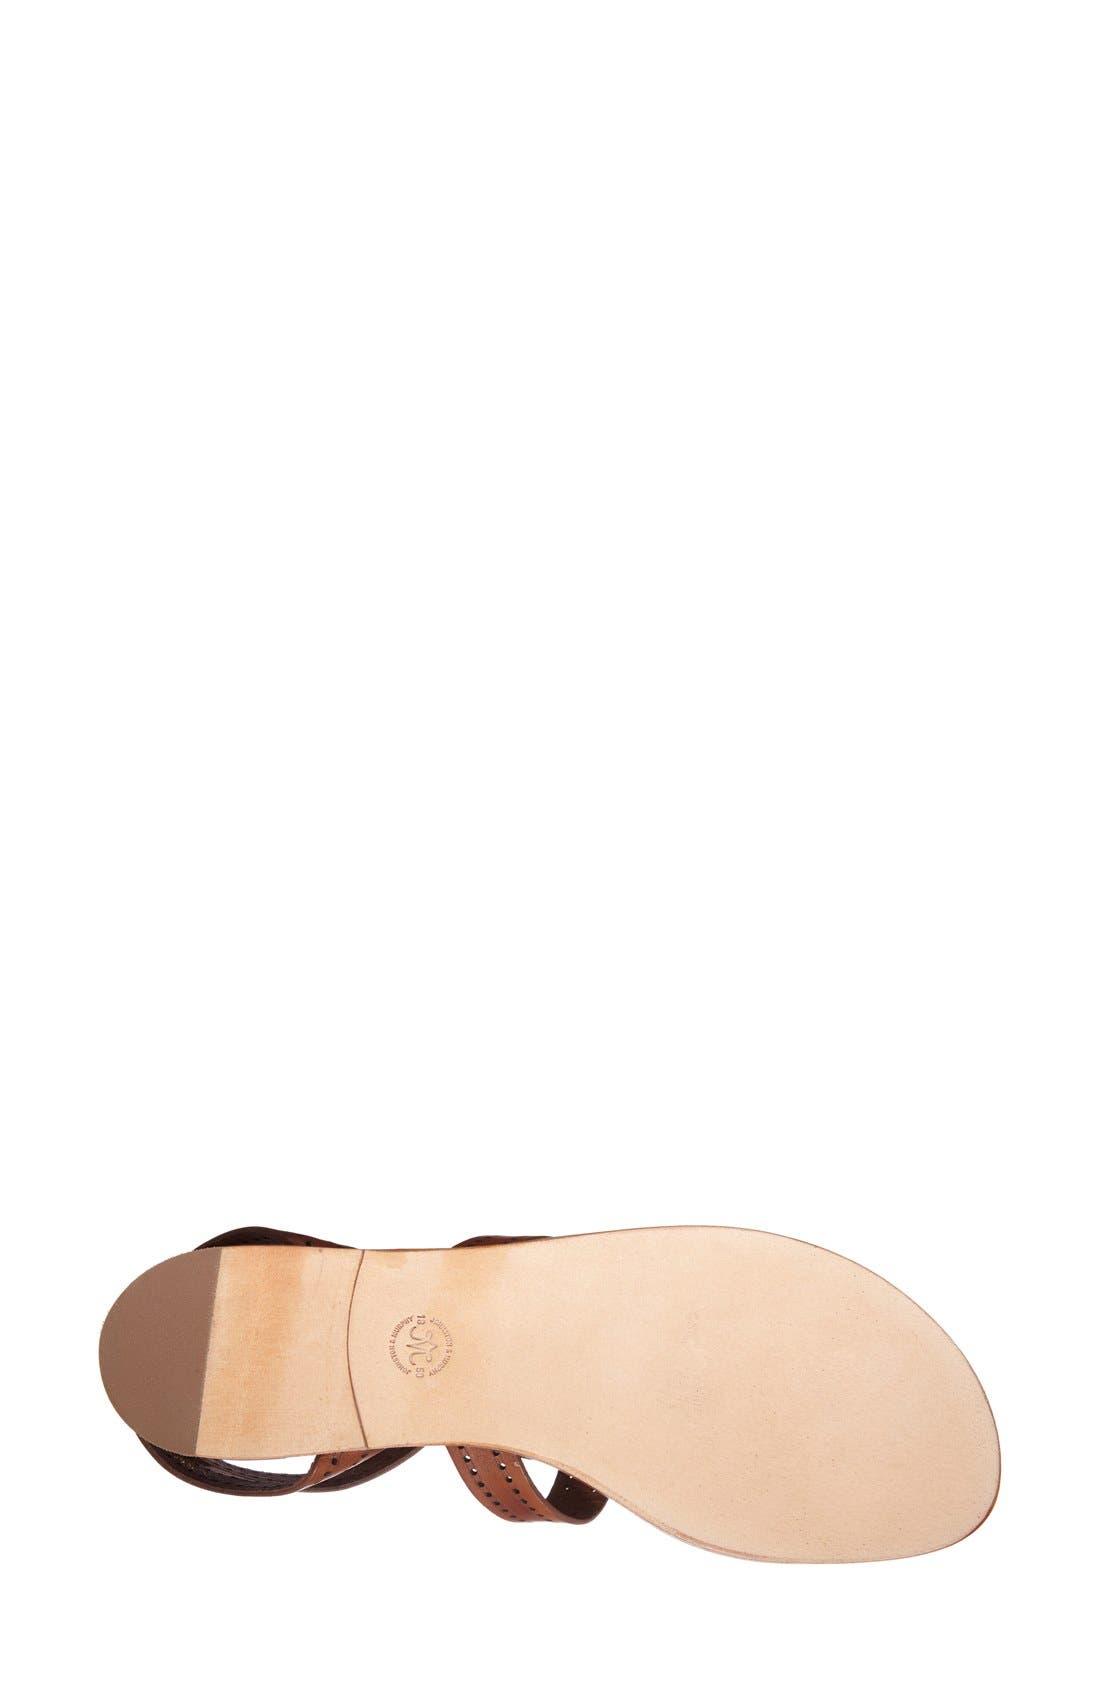 Alternate Image 4  - Johnston & Murphy 'Patti' Perforated Leather Thong Sandal (Women)